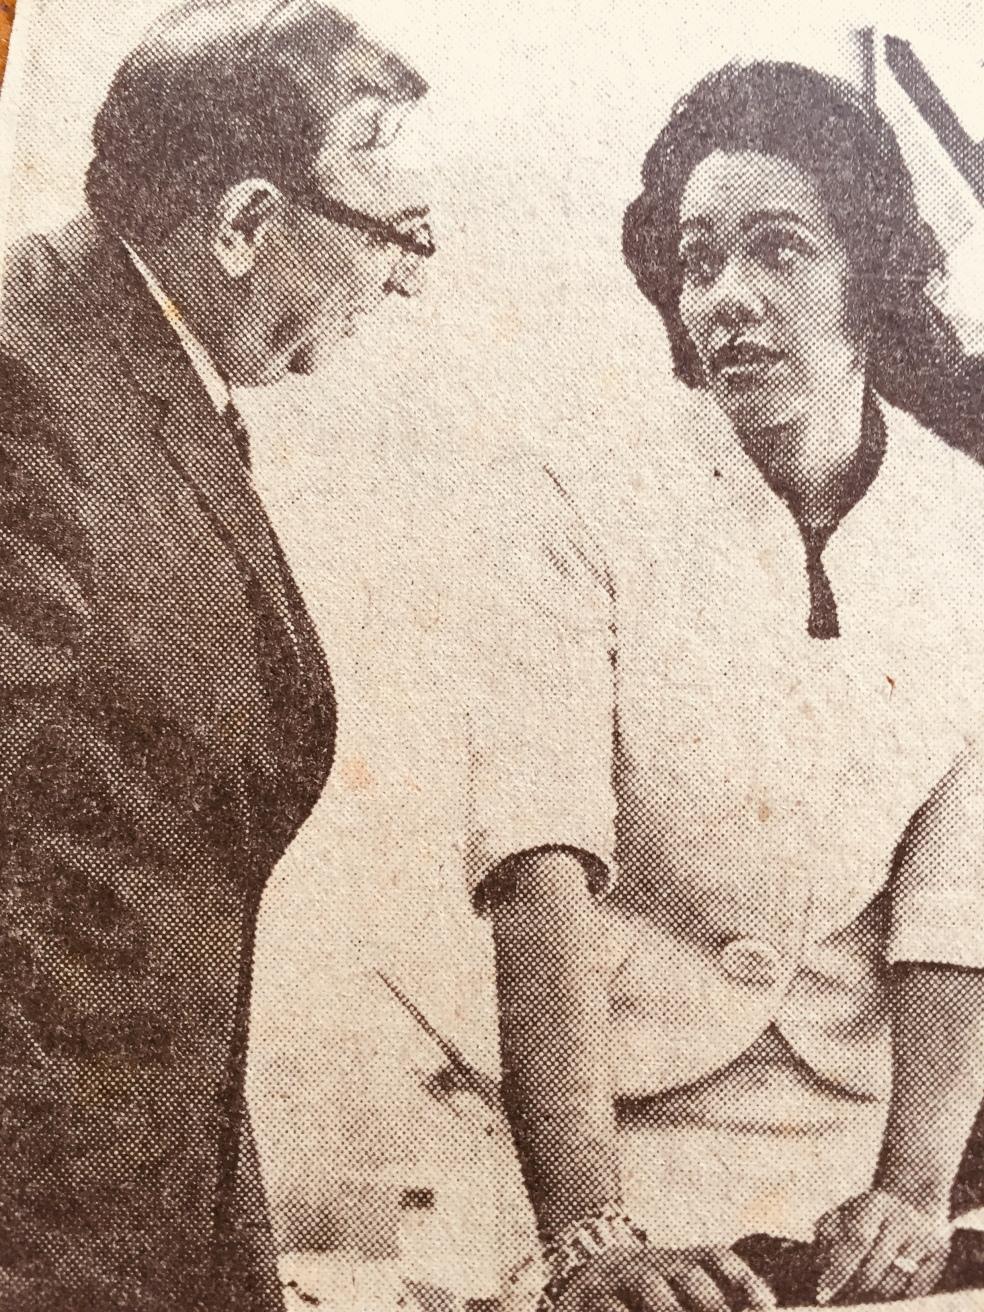 Coretta Scott King at Toronto City Hall